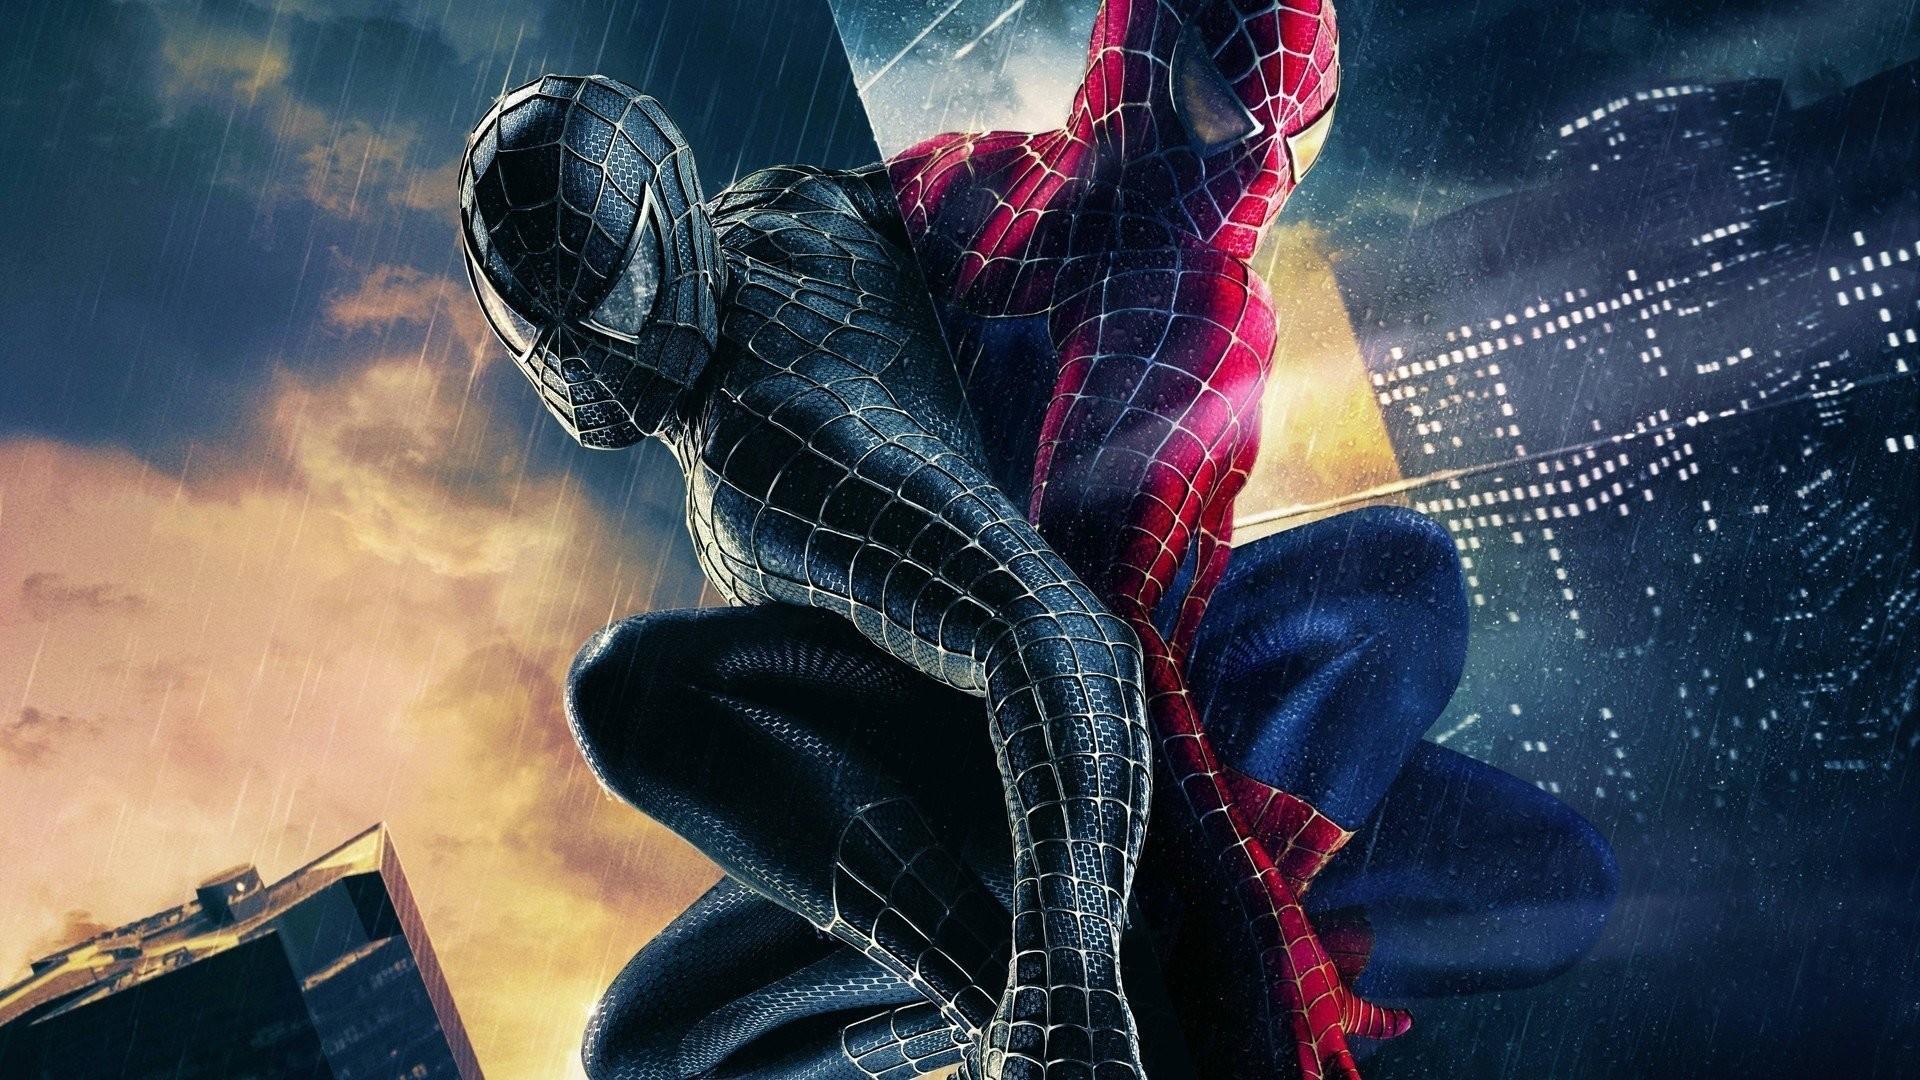 Spiderman Hd Wallpaper 1920x1080 81 Images